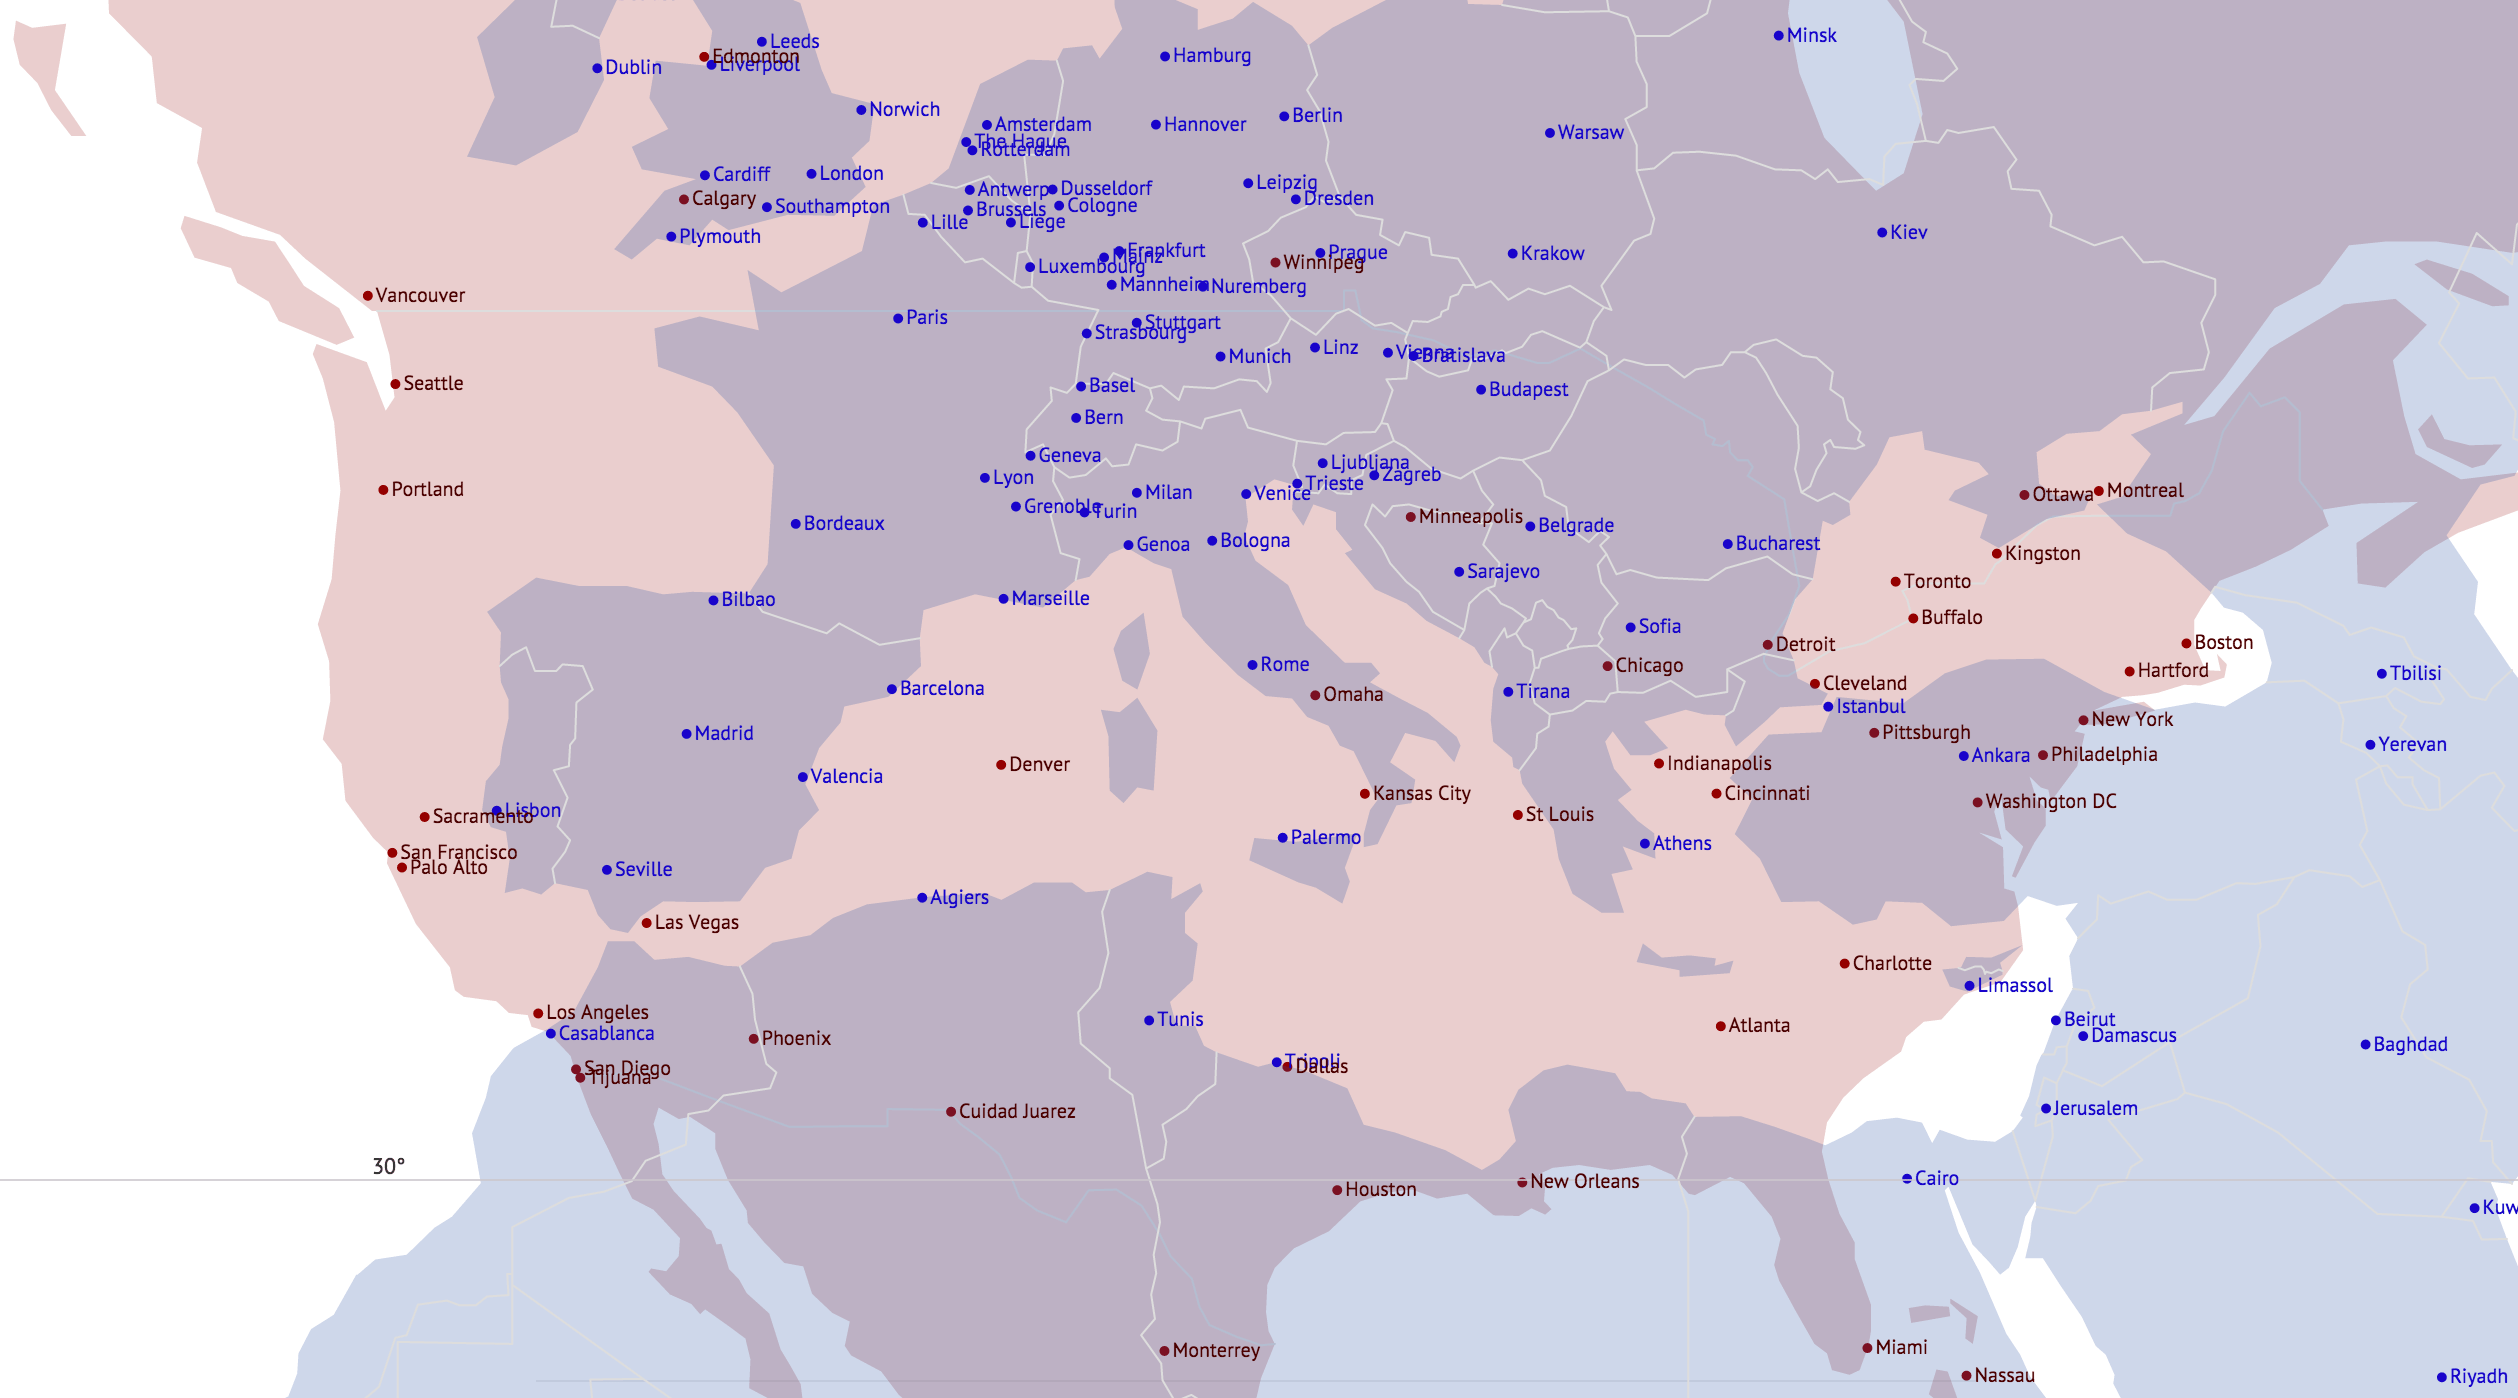 Interactive Equivalent Latitude Map